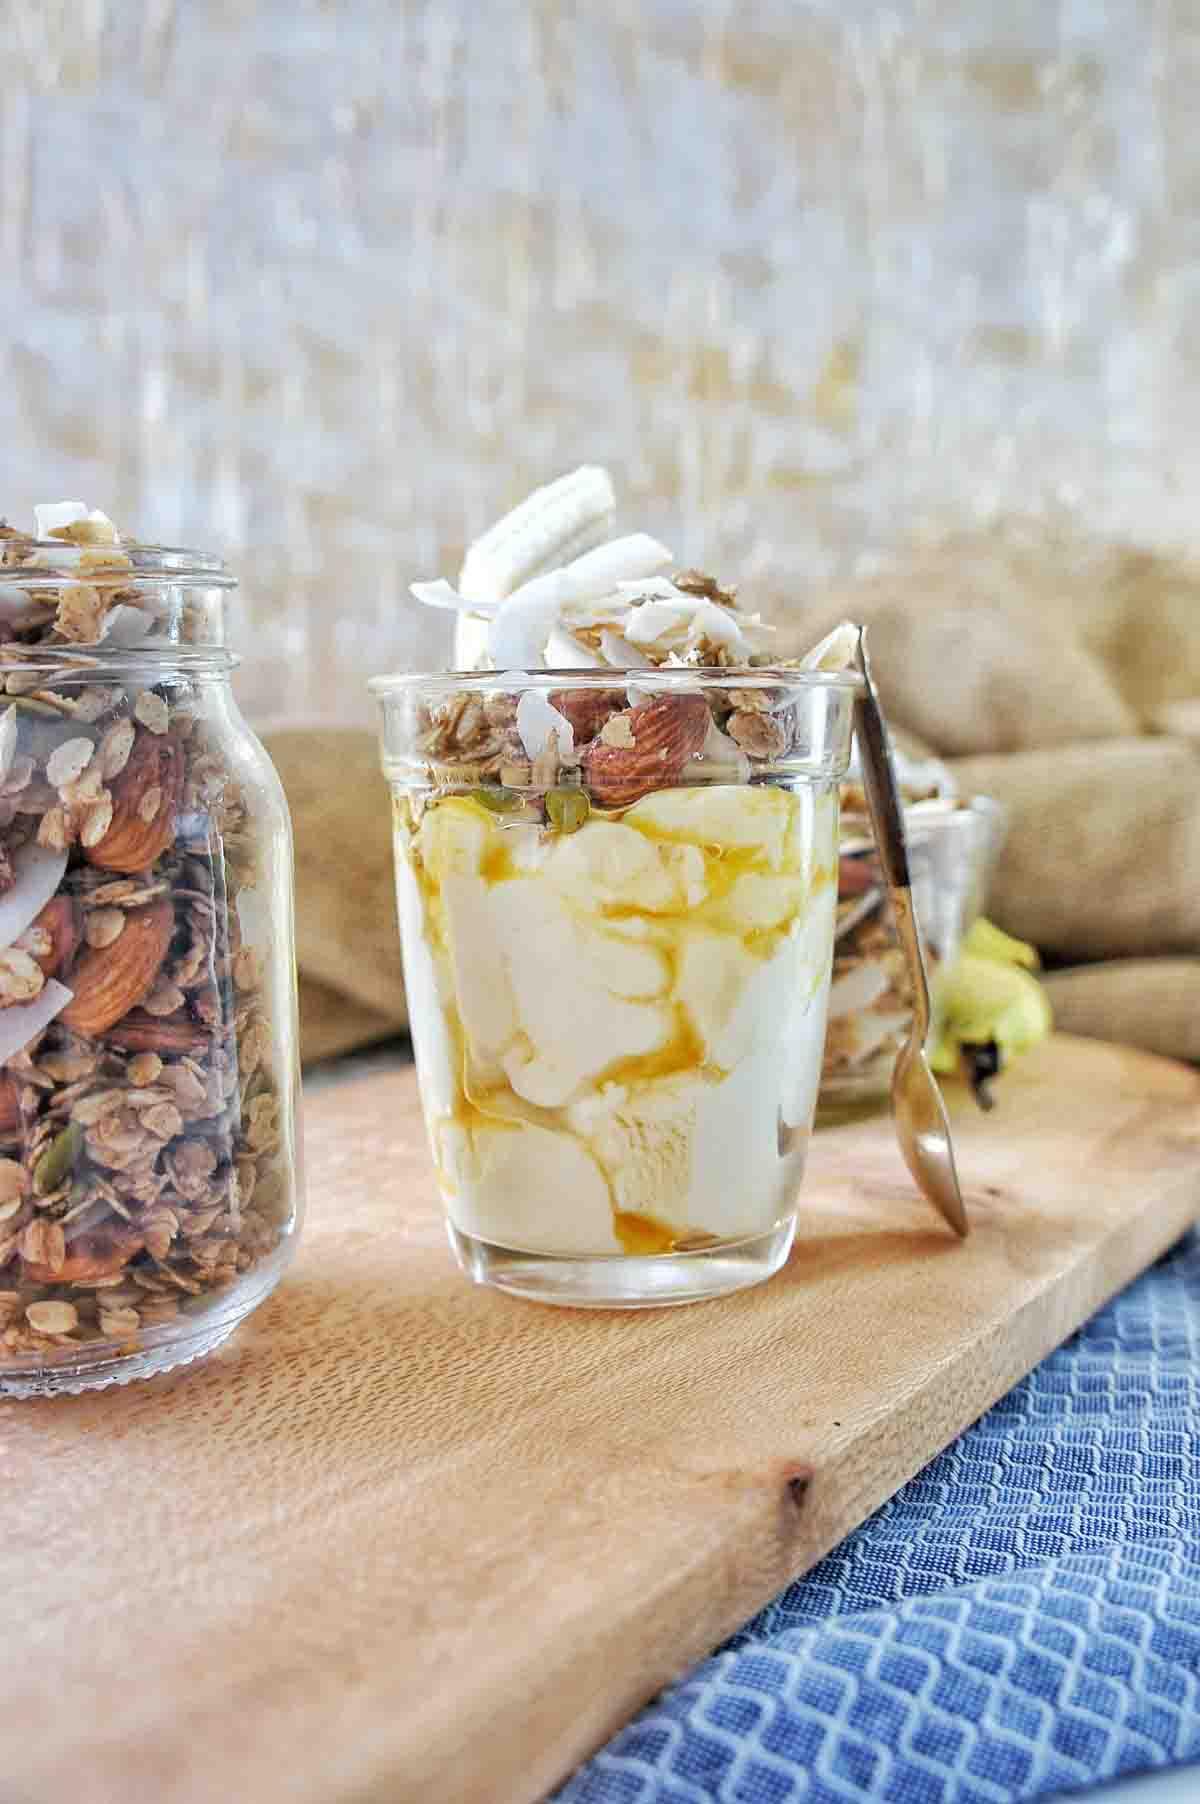 Homemade Coconut Granola 09 | Sweet Caramel Sunday